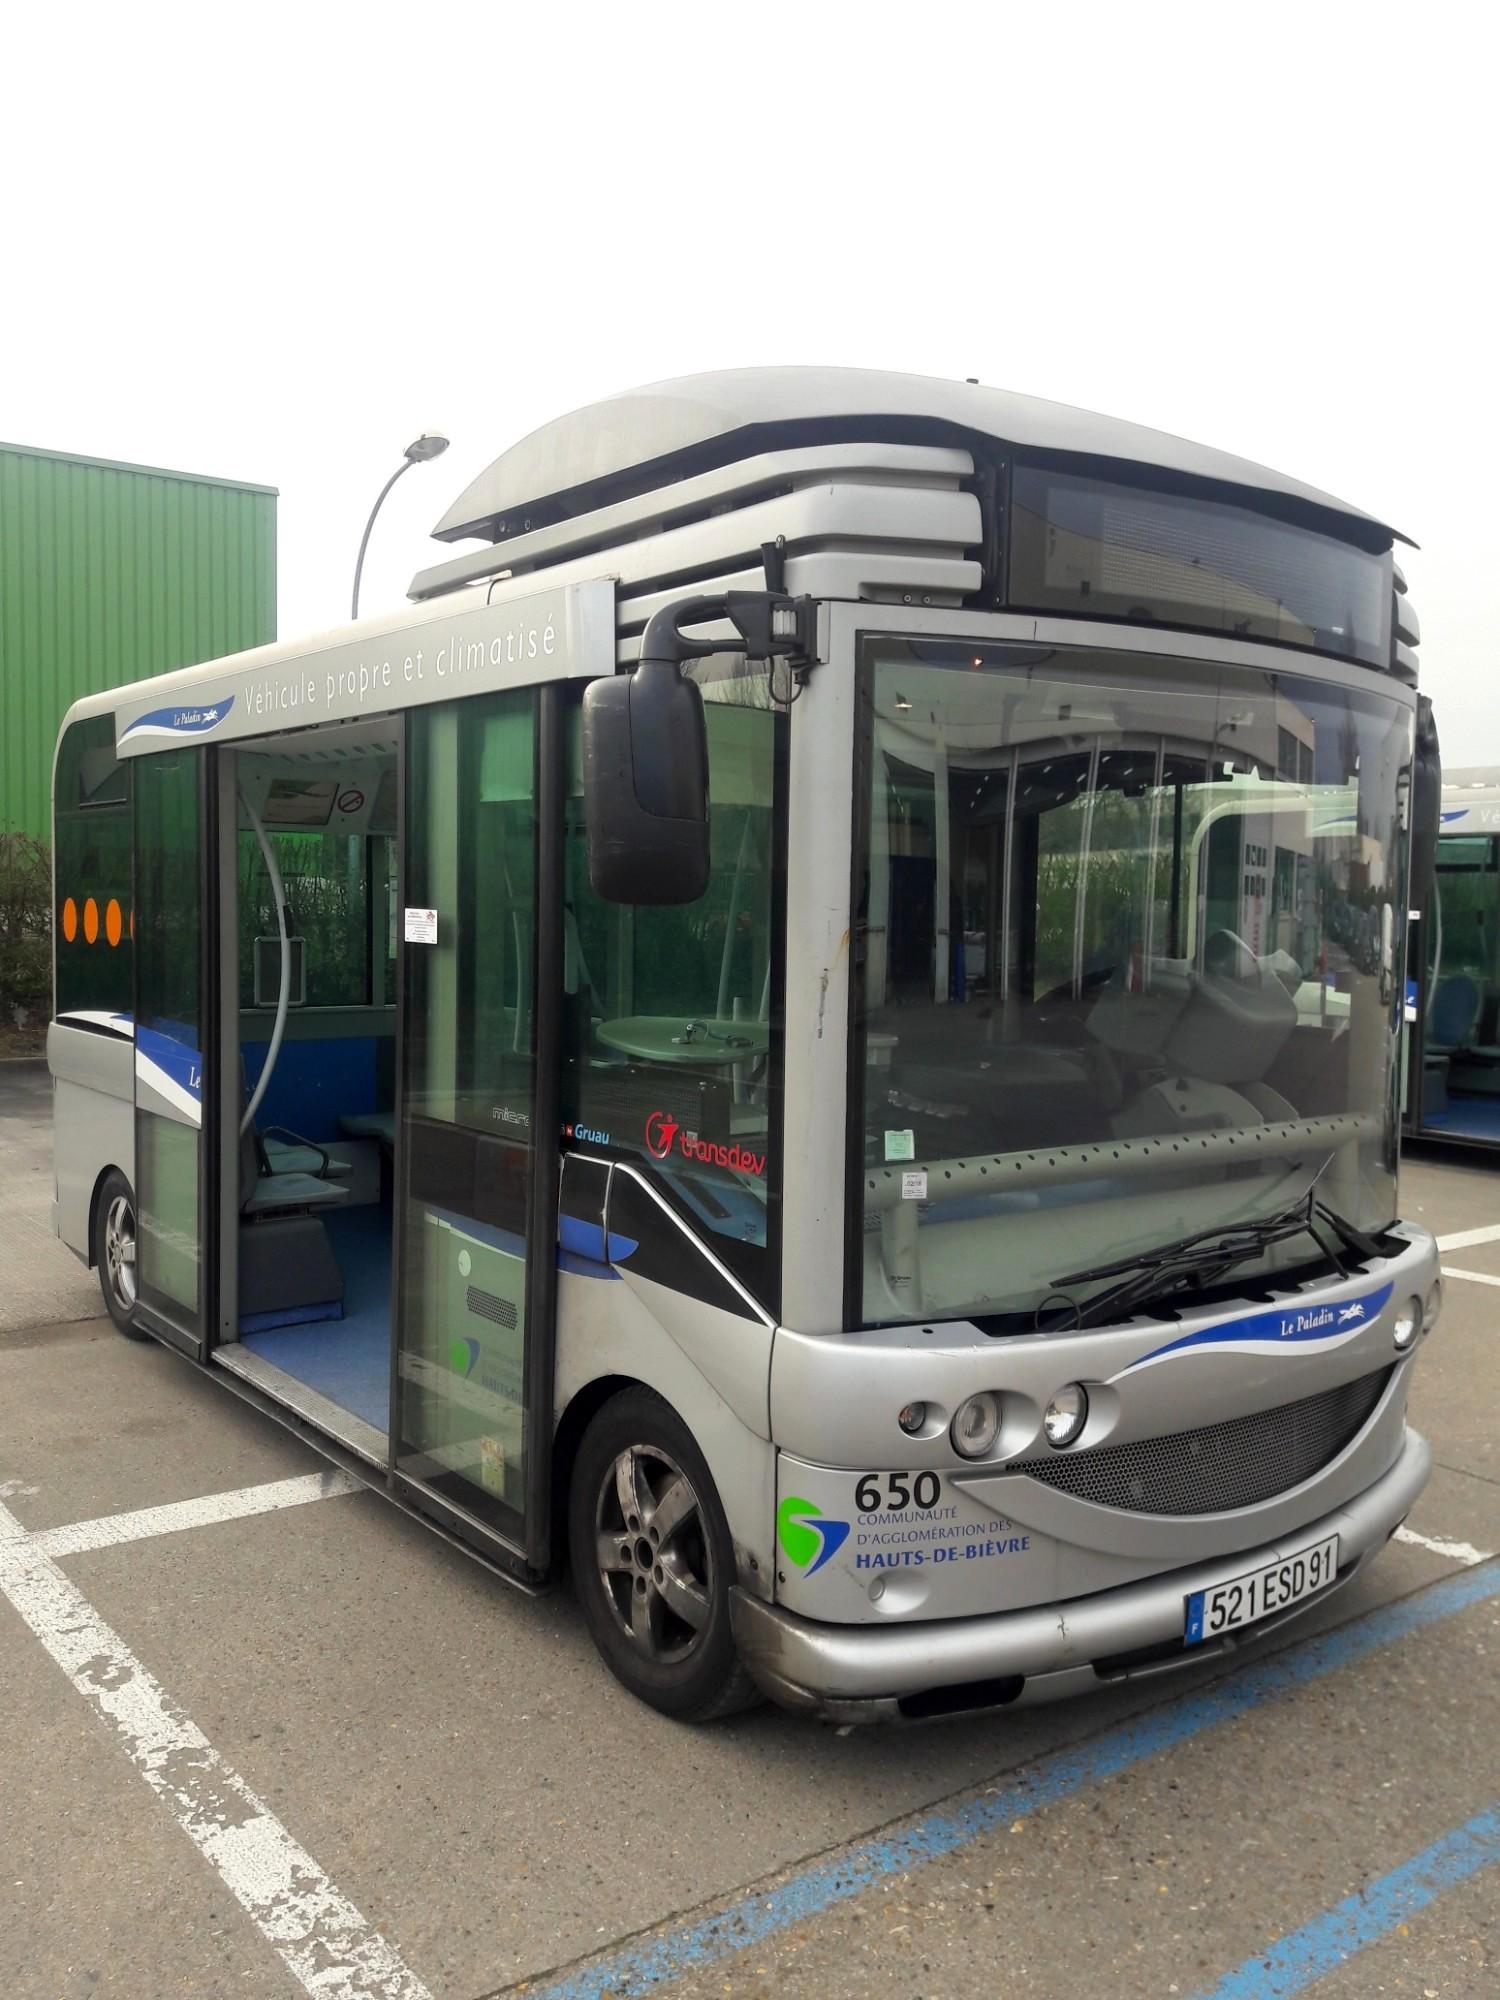 gruau microbus 93192 650 car bus d 39 occasion aux ench res agorastore. Black Bedroom Furniture Sets. Home Design Ideas